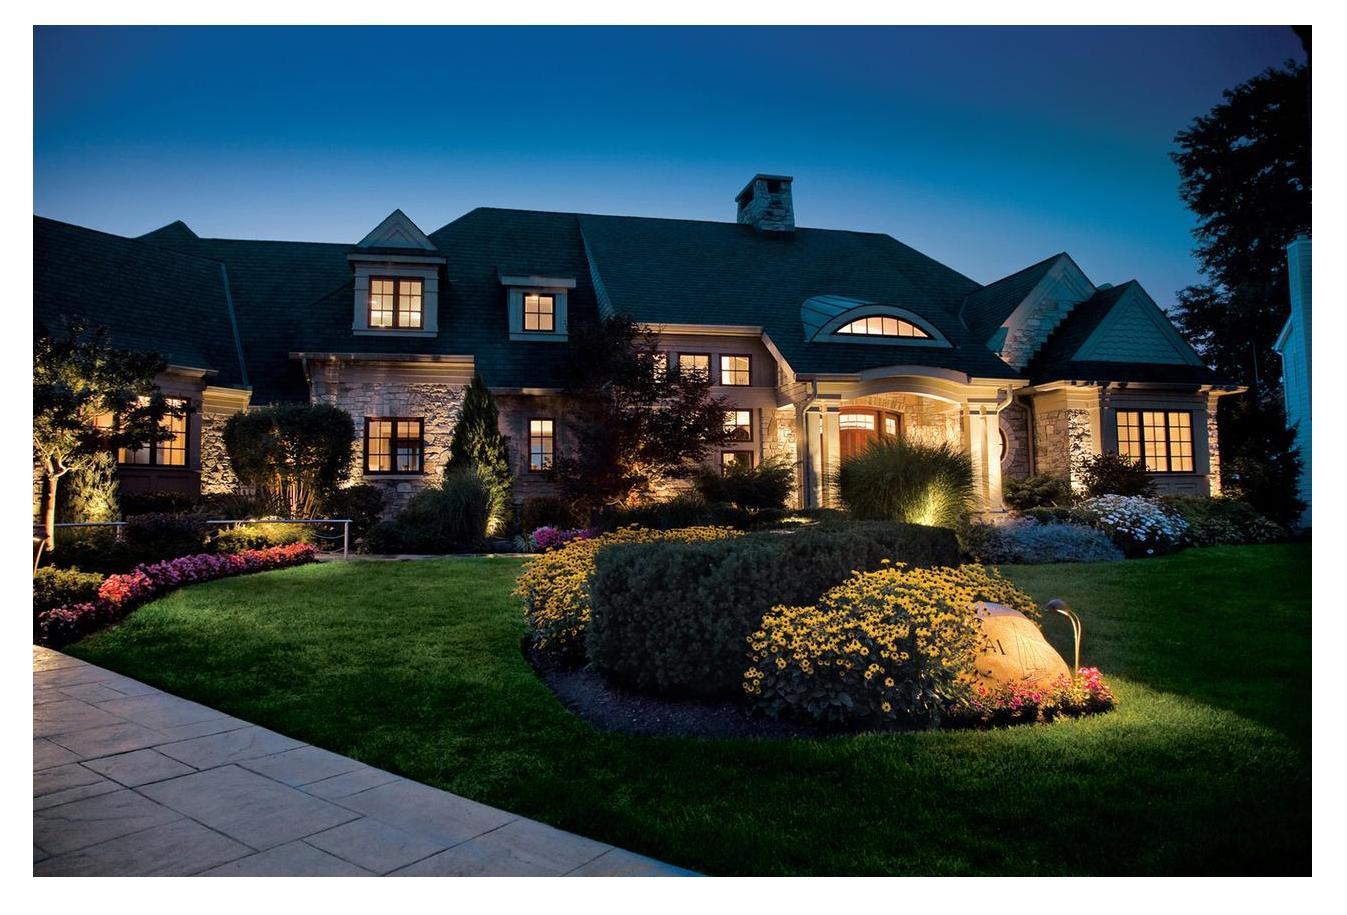 Best Buy Complete Premium Landscape Lighting DIY Kits